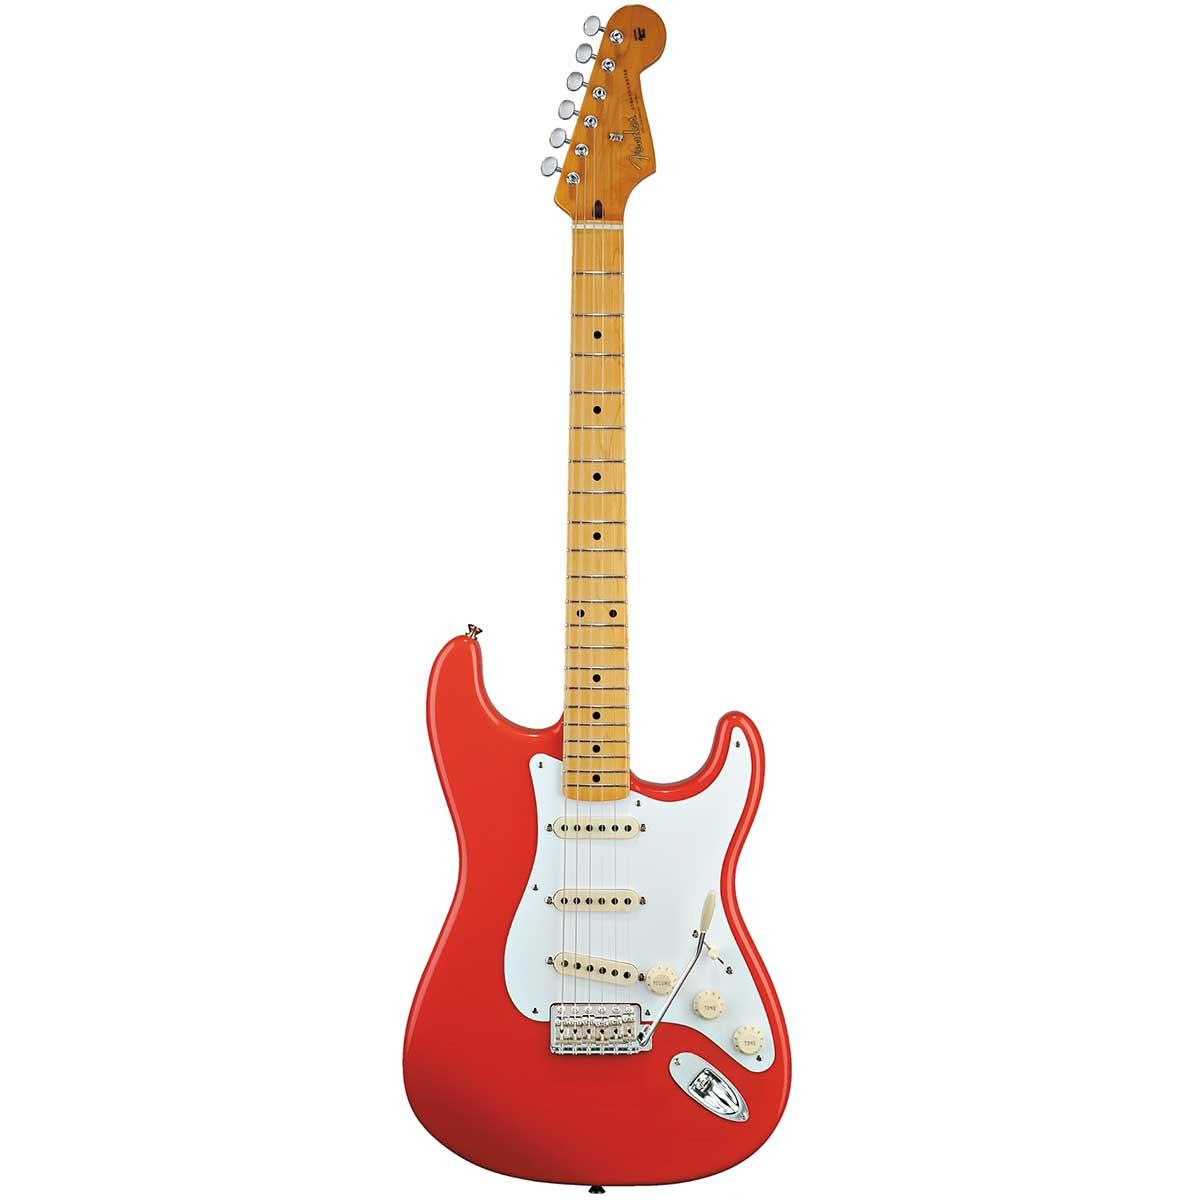 Fender ClassicSeries50sStratocaster,MN,FRD el-guitar fiestared